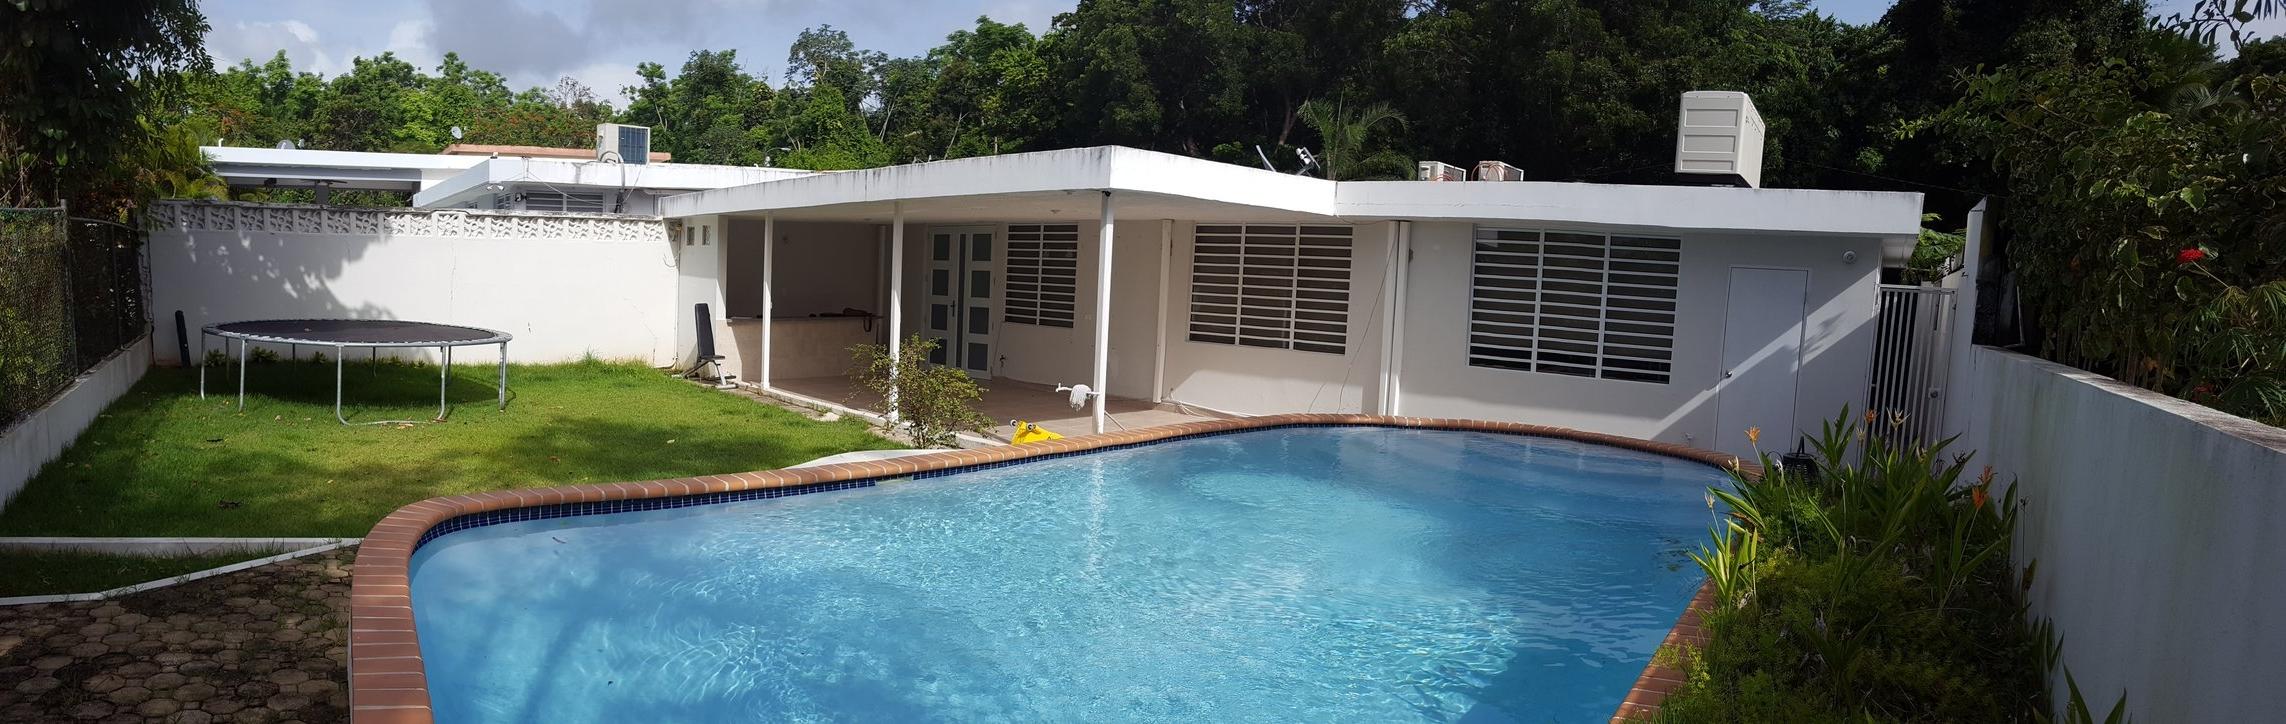 Terraza Rio Piedras One Studio Llc